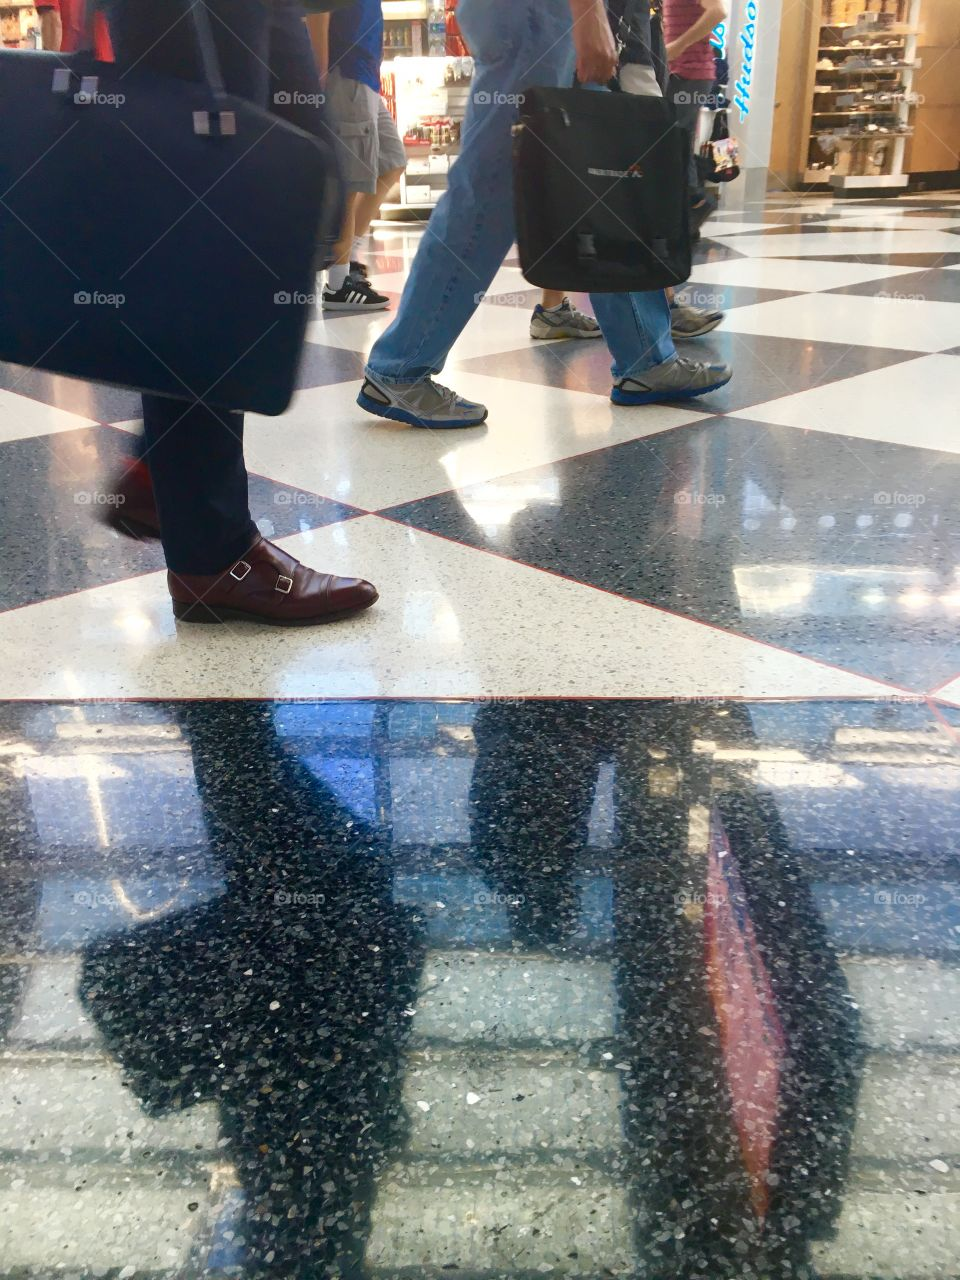 Airport scuffle